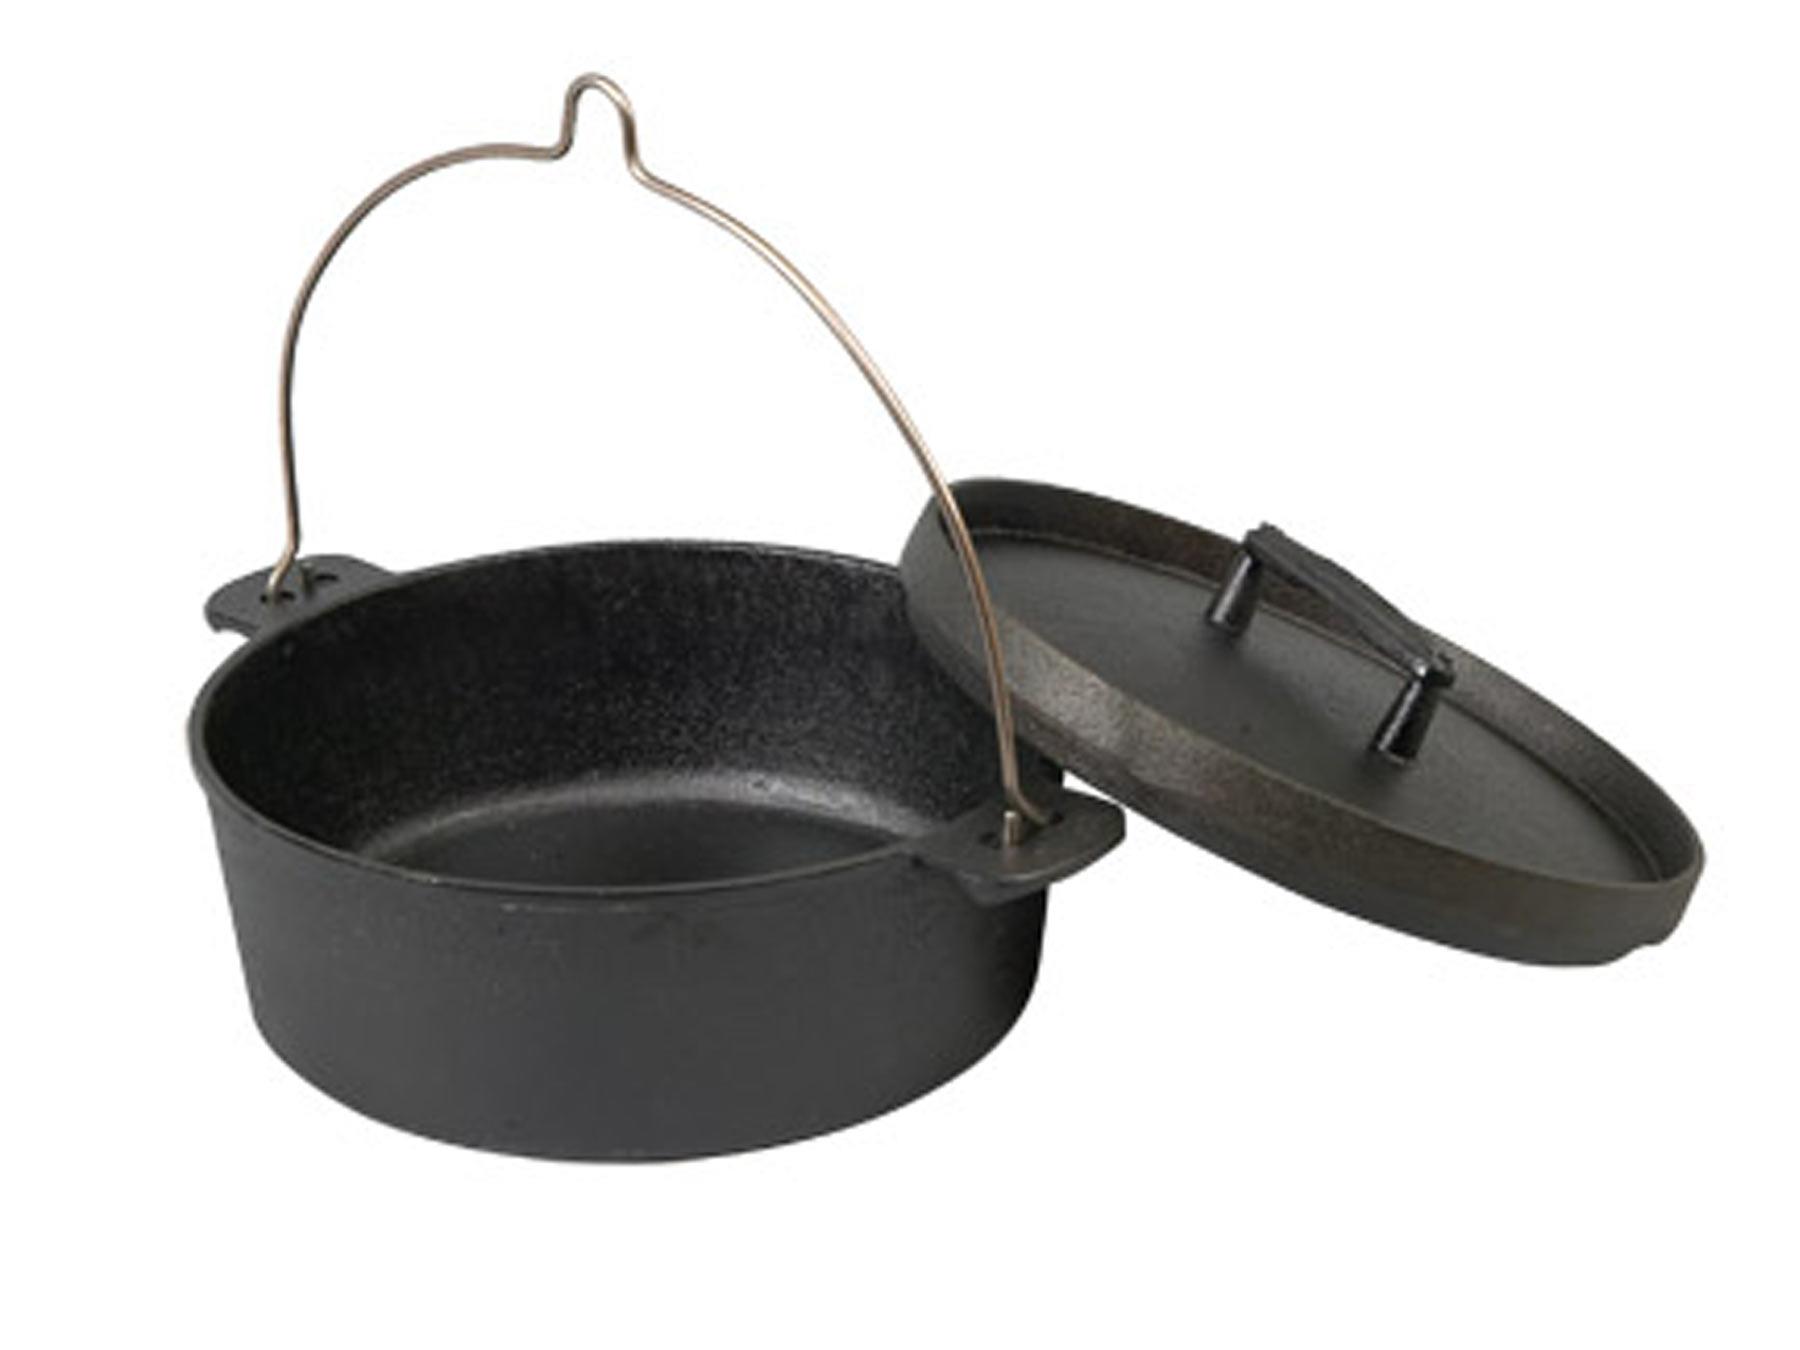 Skeppshult Topf Dutch Oven 5,5 l mit Gusseisendeckel